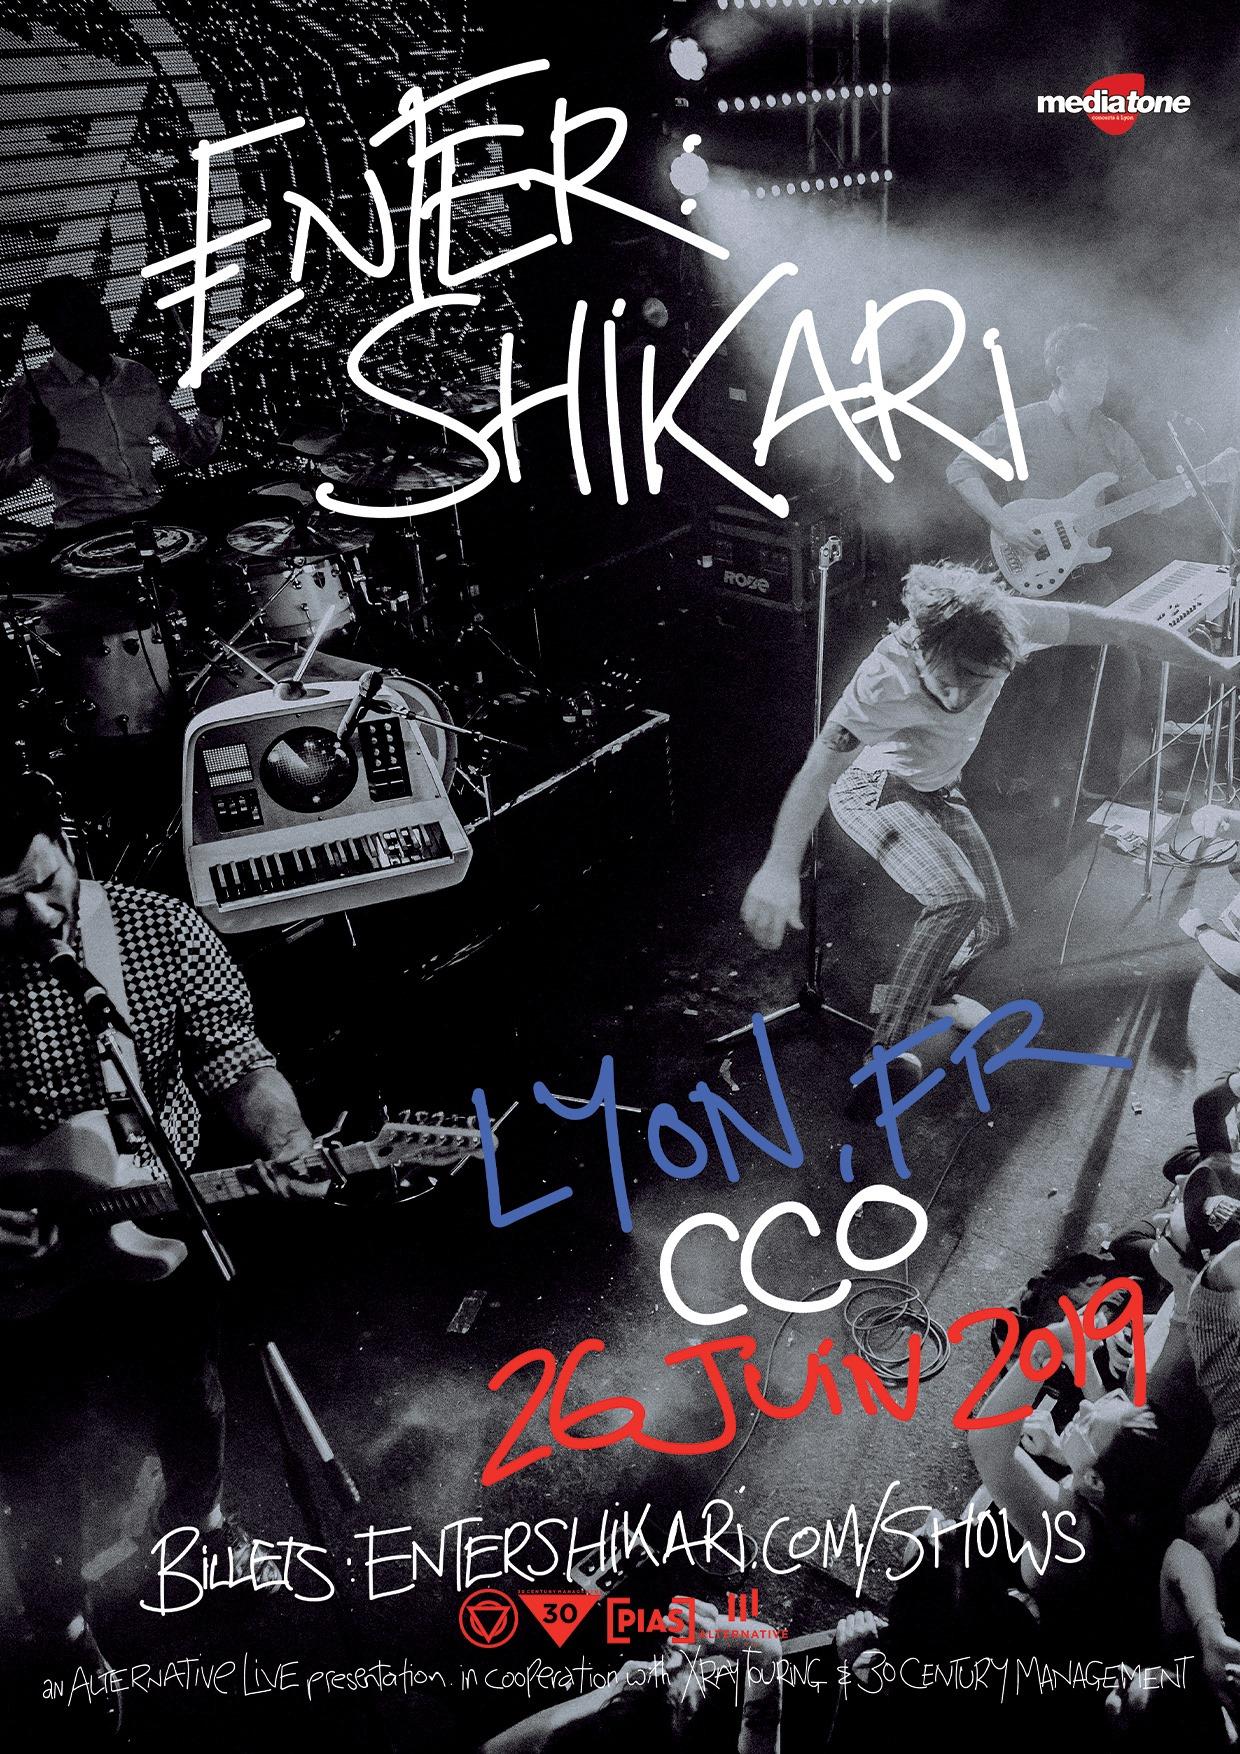 Enter Shikari oakman CCO Lyon alternative live mediatone